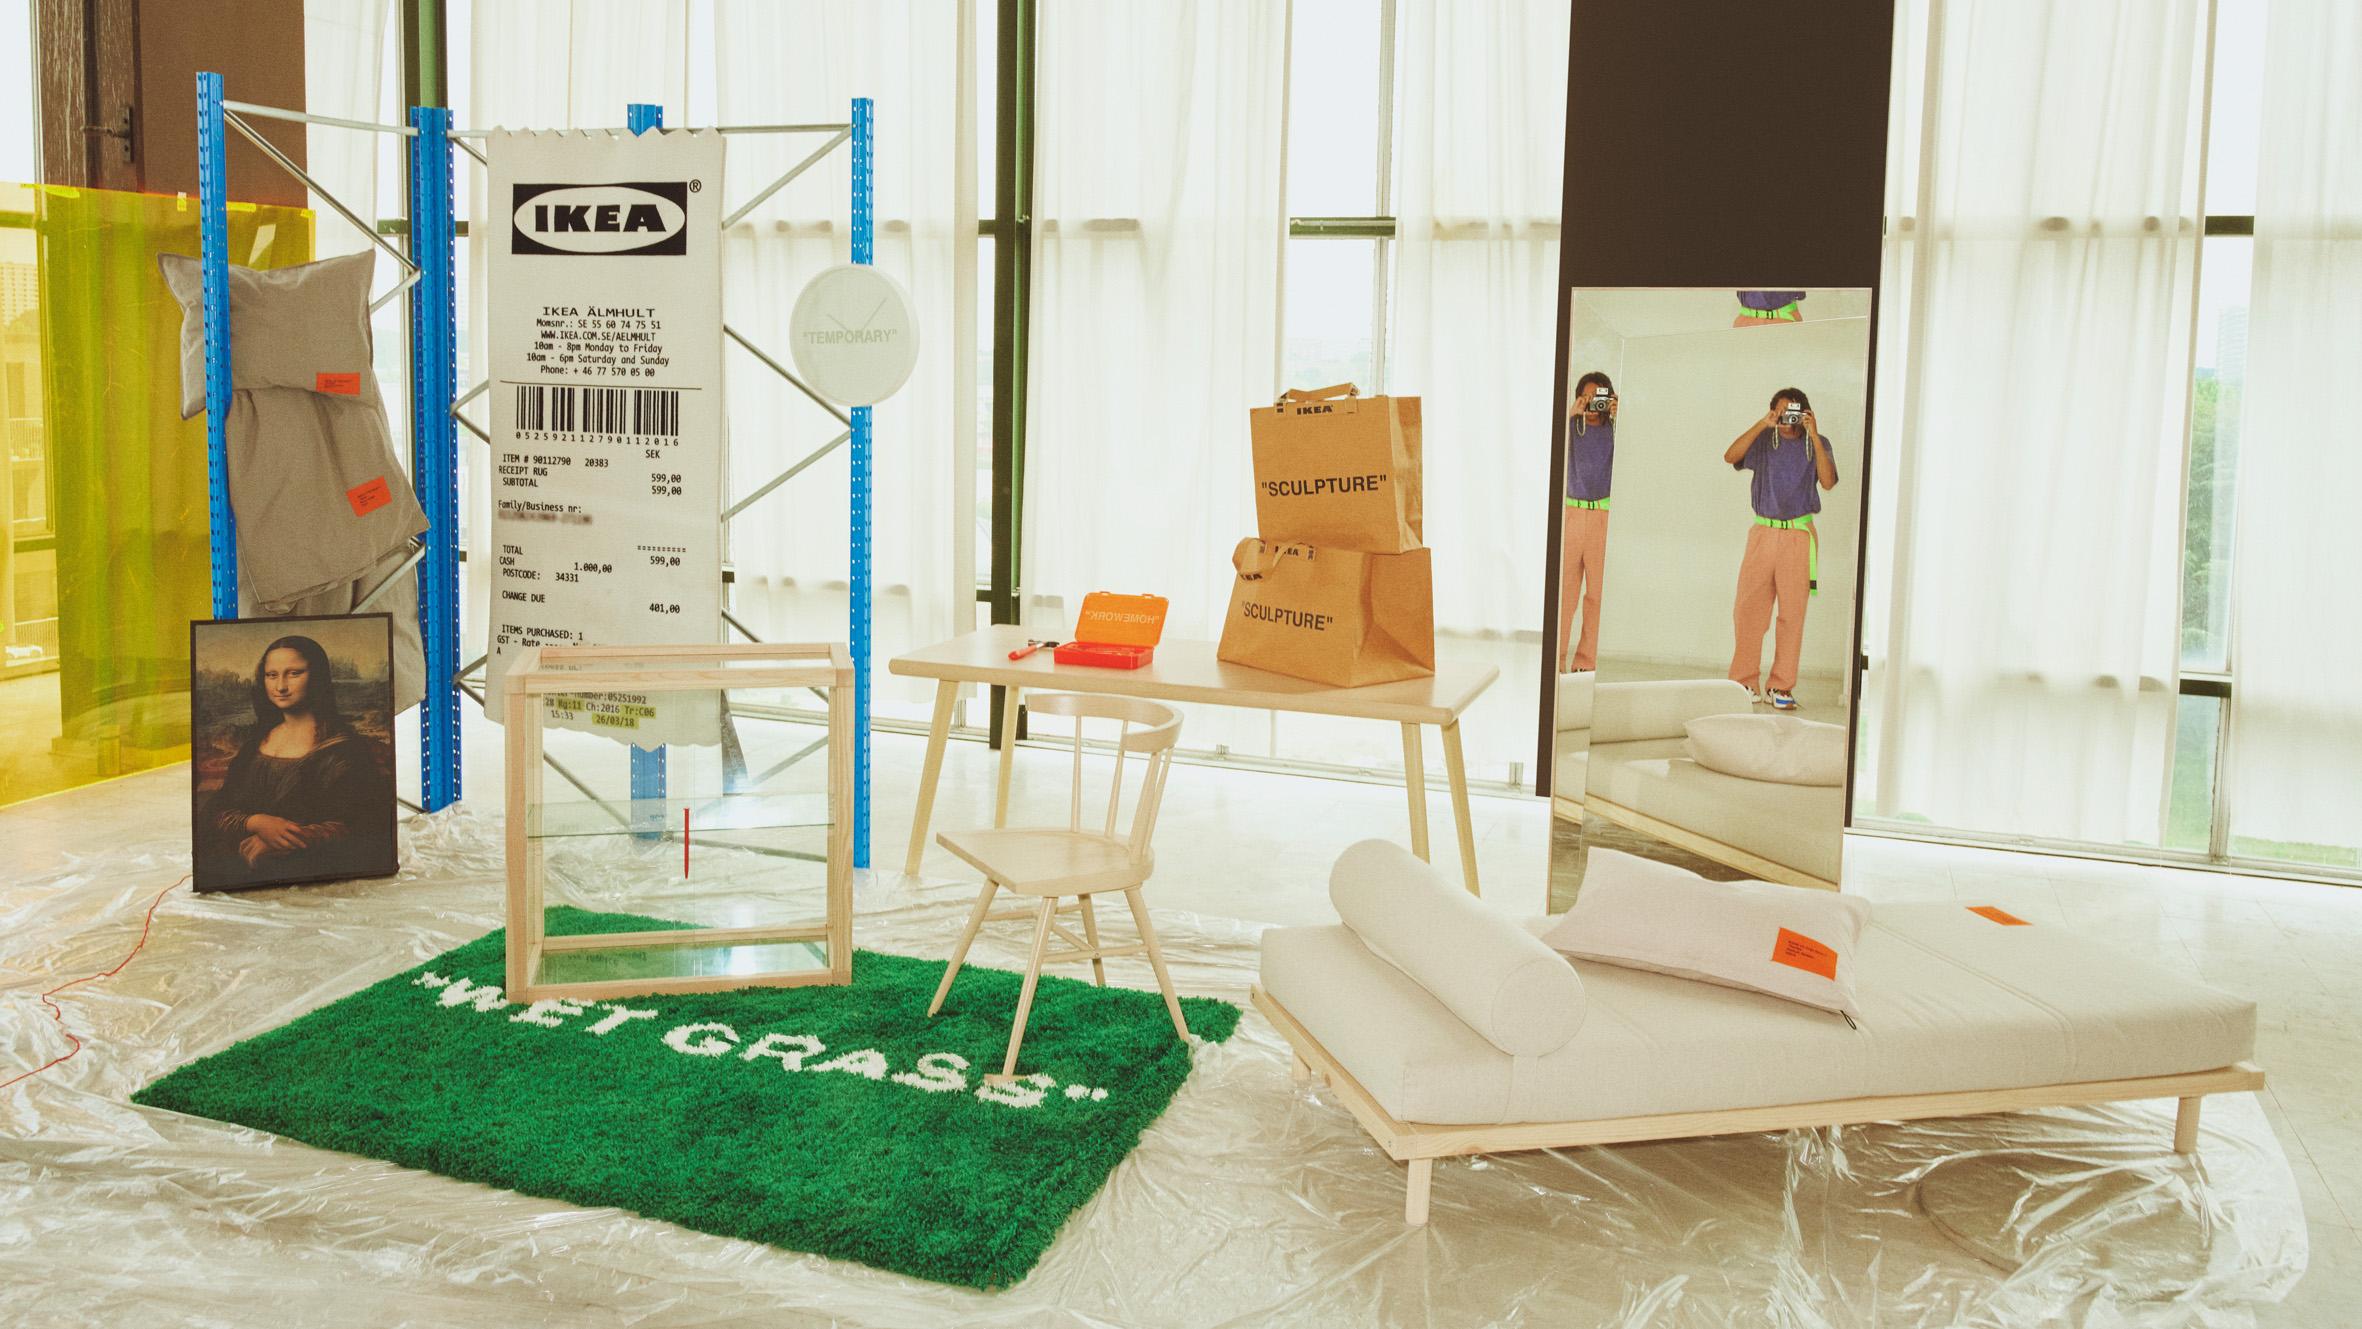 Full Size of Liegestuhl Holz Stoff Ikea Klappbar Aktuellen Austria Pressroom Sofa Mit Holzfüßen Küche Kaufen Bett Massivholz 180x200 Betten Aus Bei Holzküche Holzbrett Wohnzimmer Liegestuhl Holz Ikea